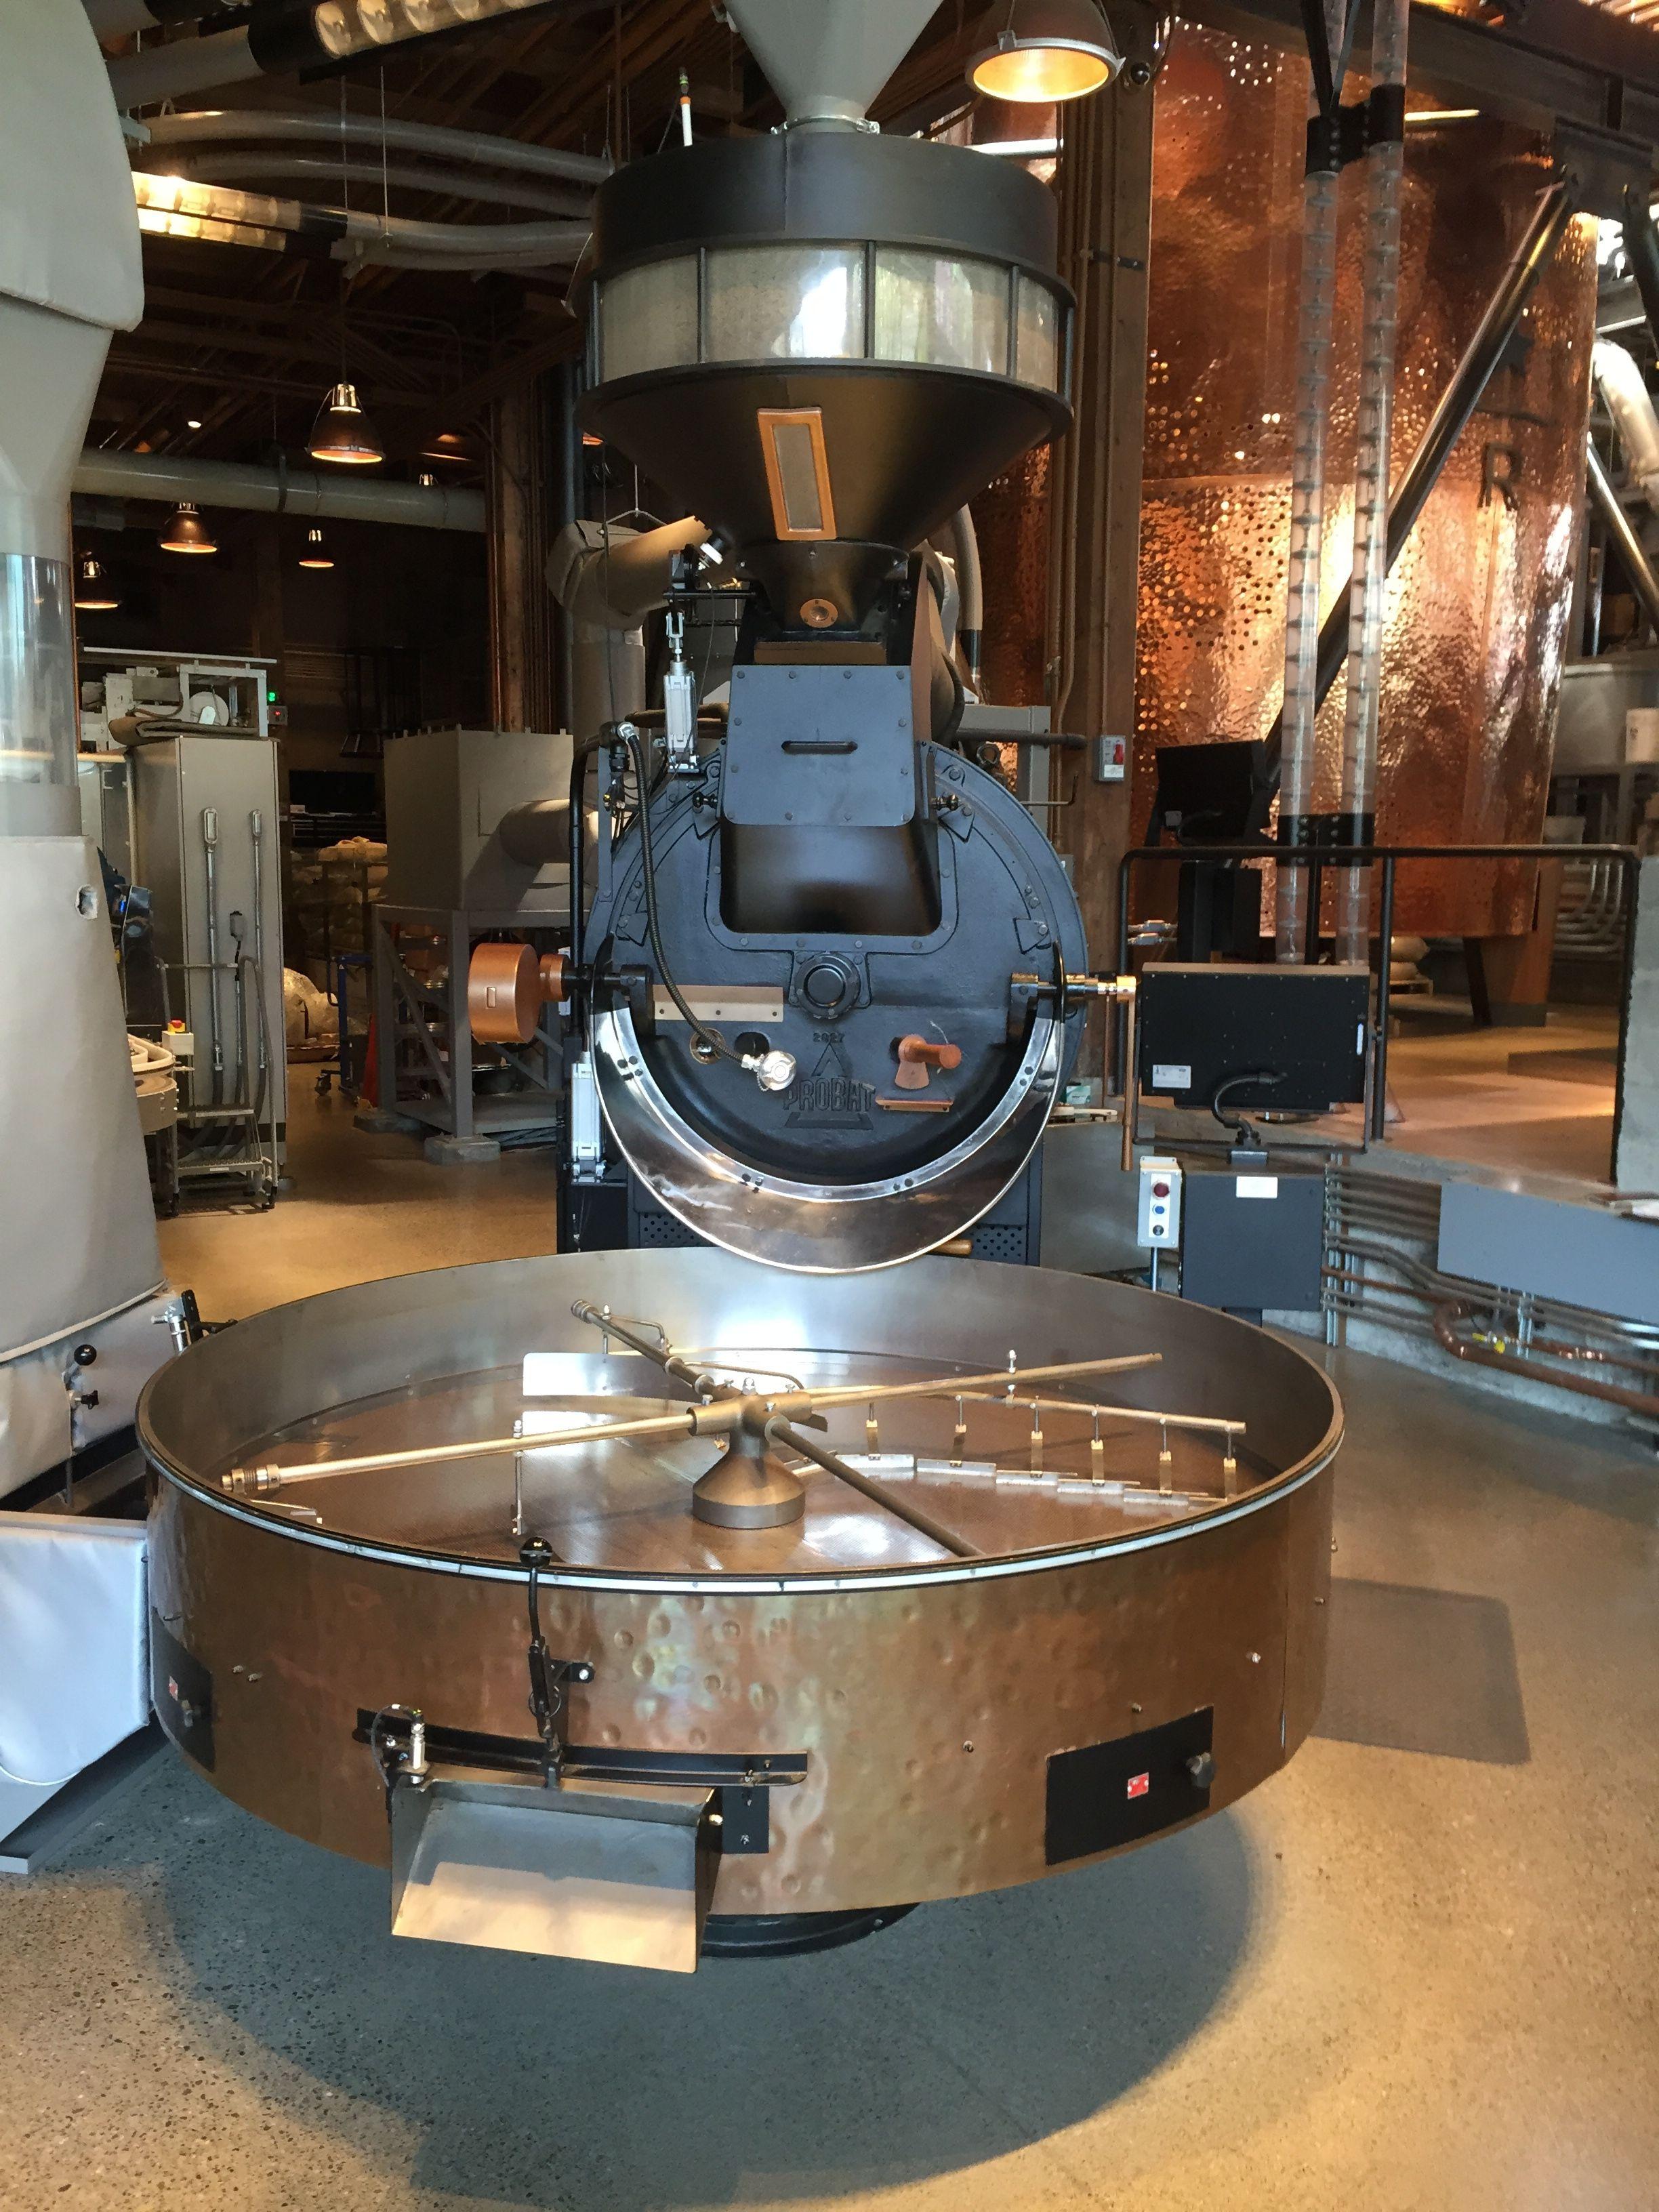 Pin by Patrick Seeney on Starbucks Roastery Espresso